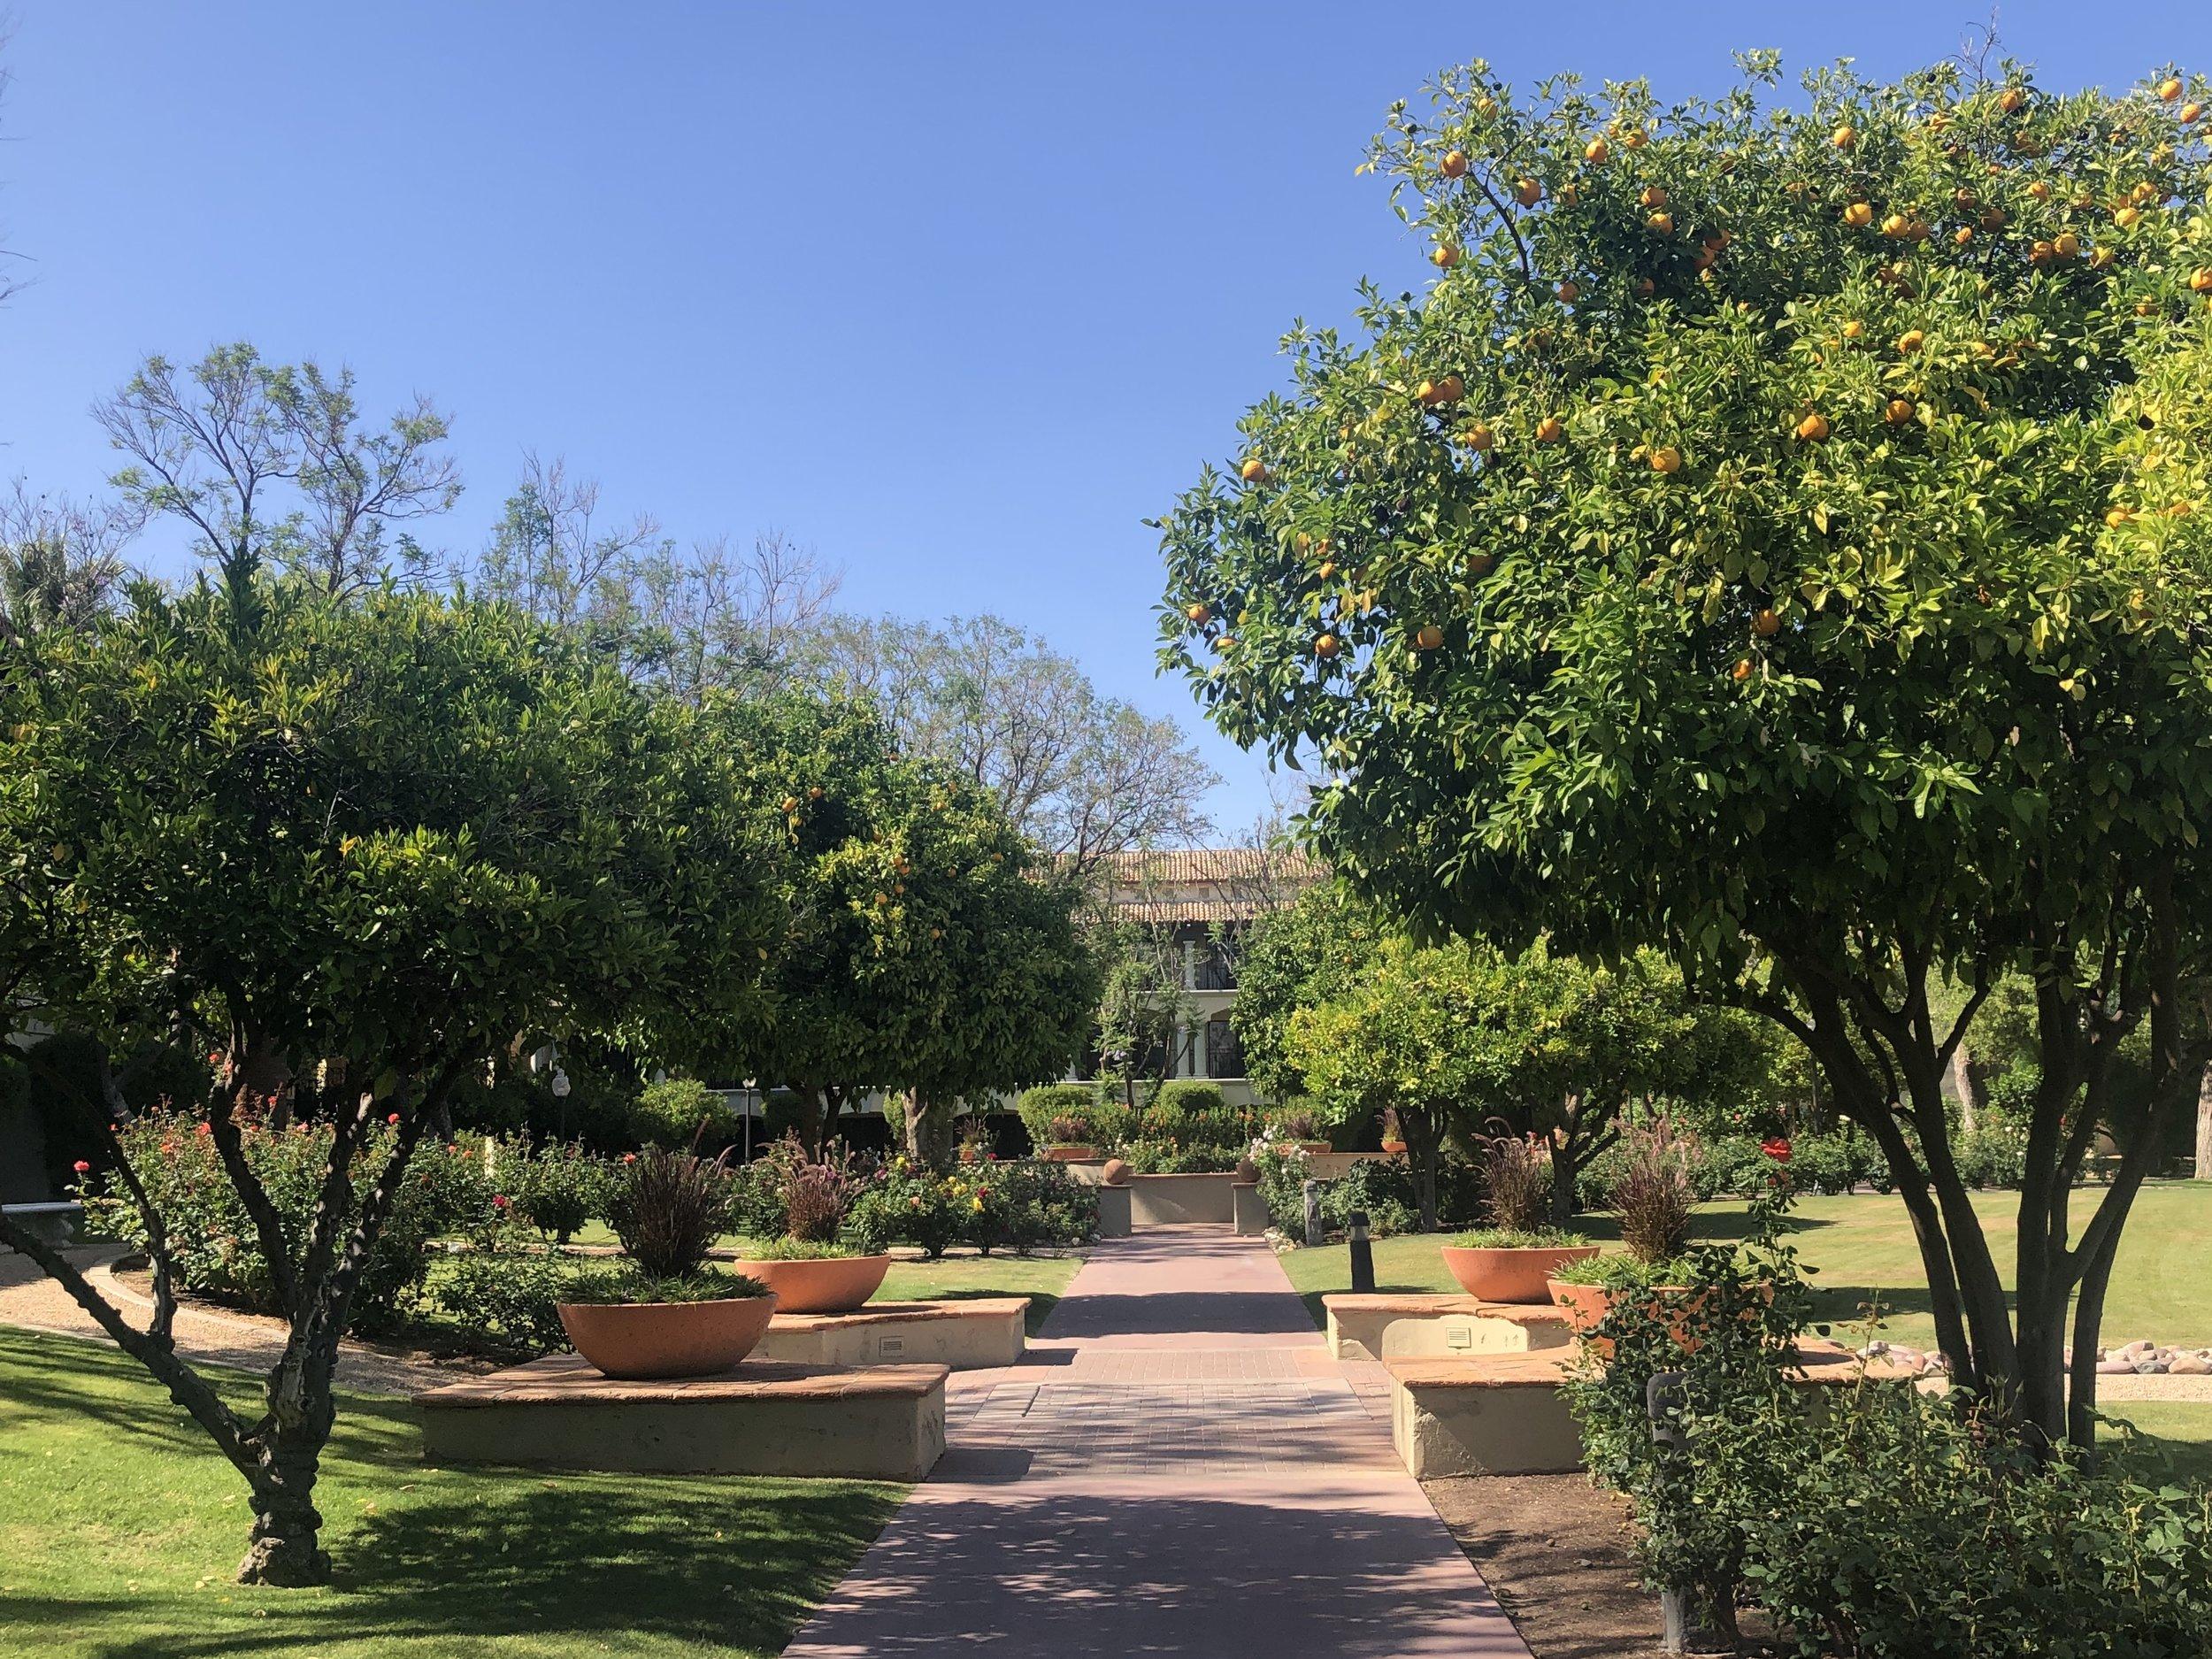 Wanderlust-travel-blog-Fairmont-Scottsdale-Princess-Arizona-hotel